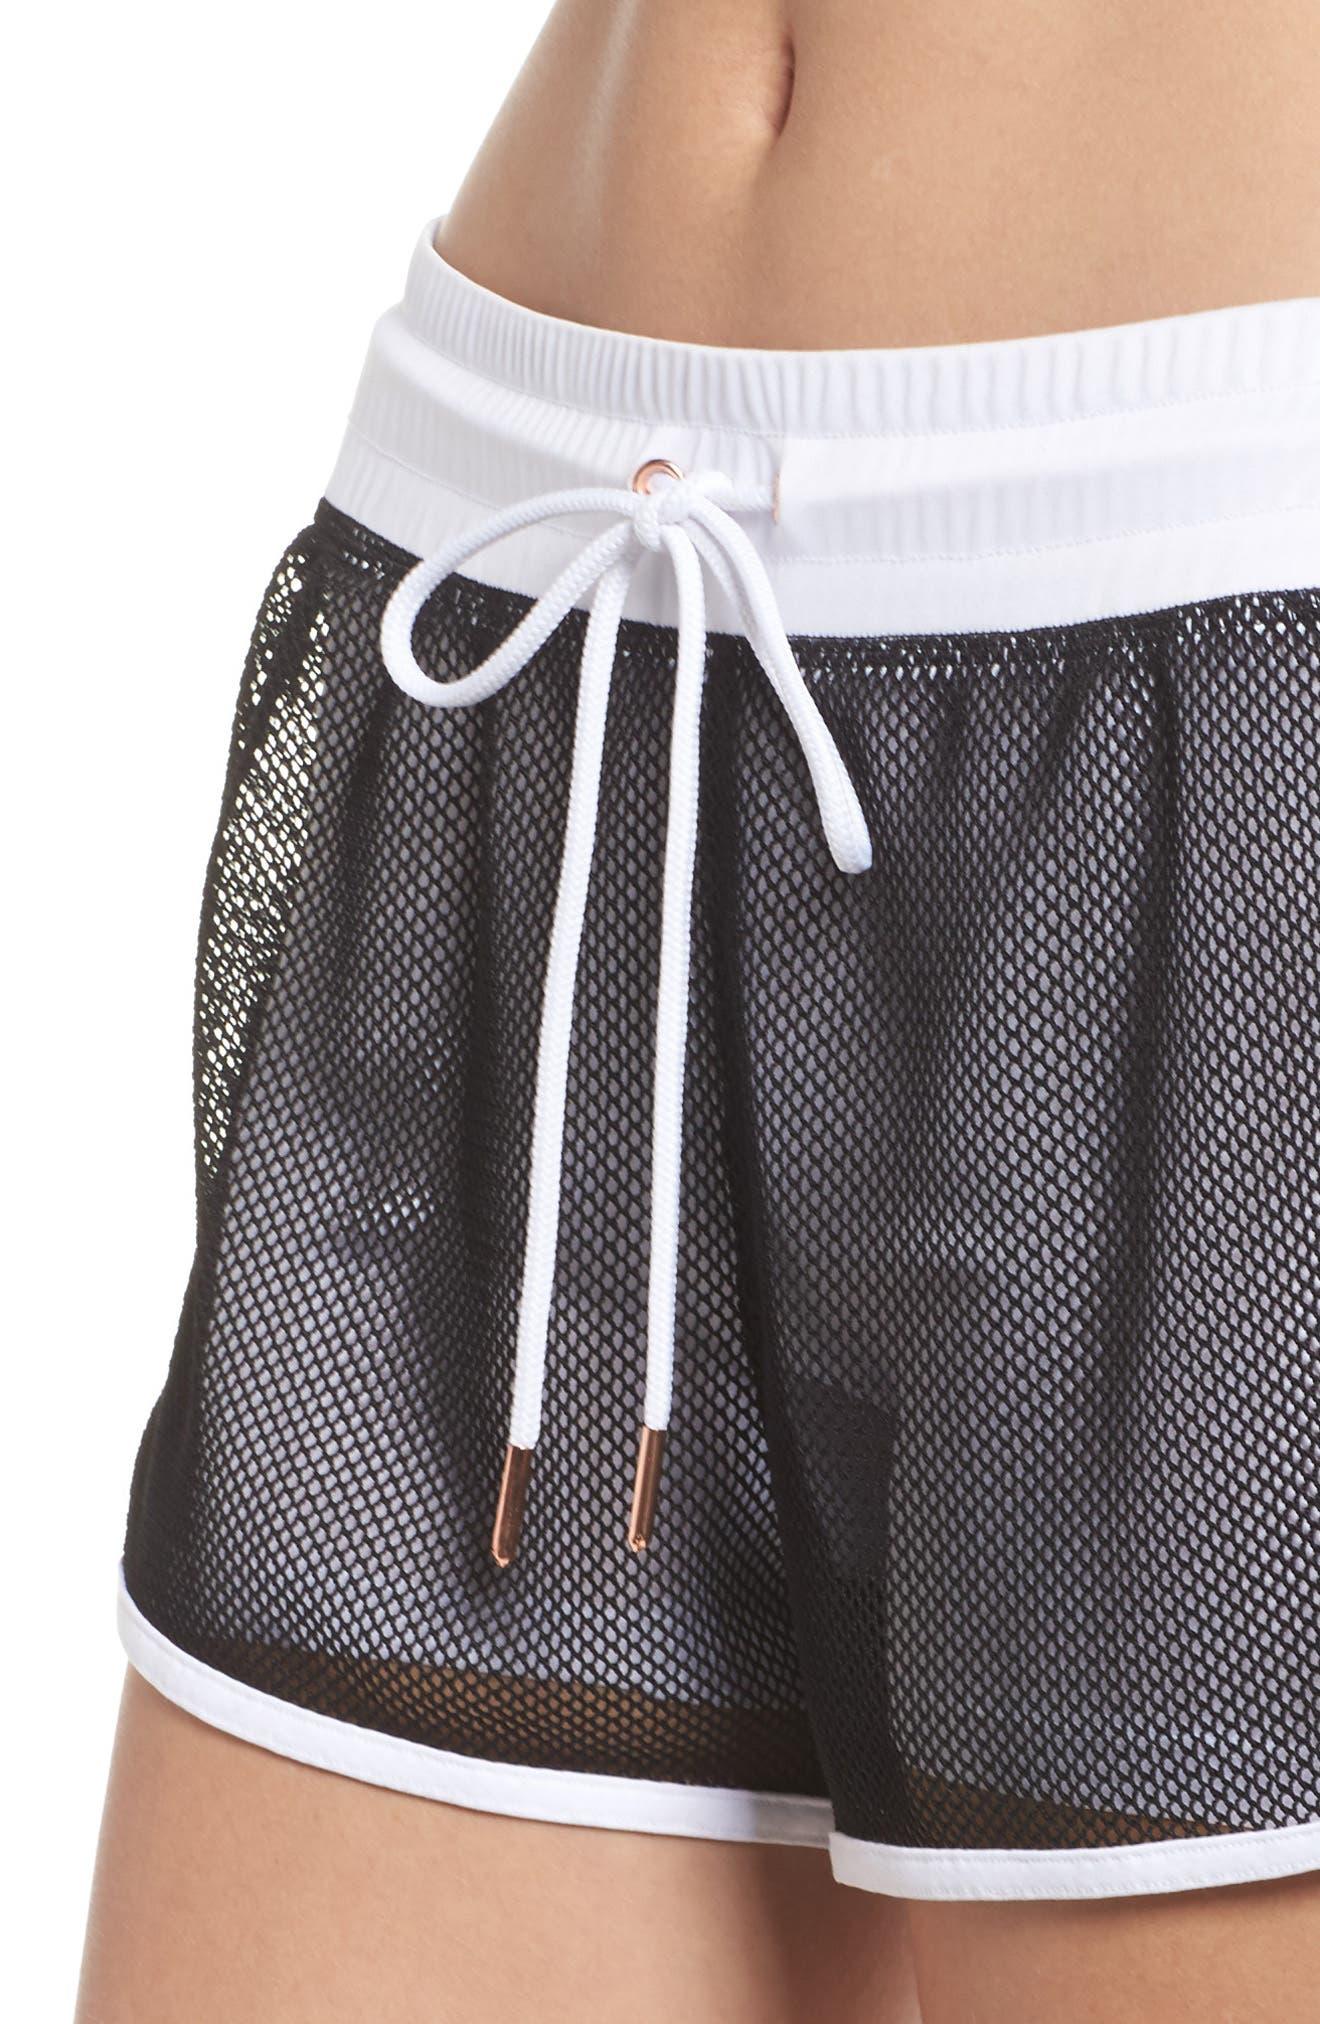 Mesh 2-in-1 Mesh Shorts,                             Alternate thumbnail 4, color,                             White